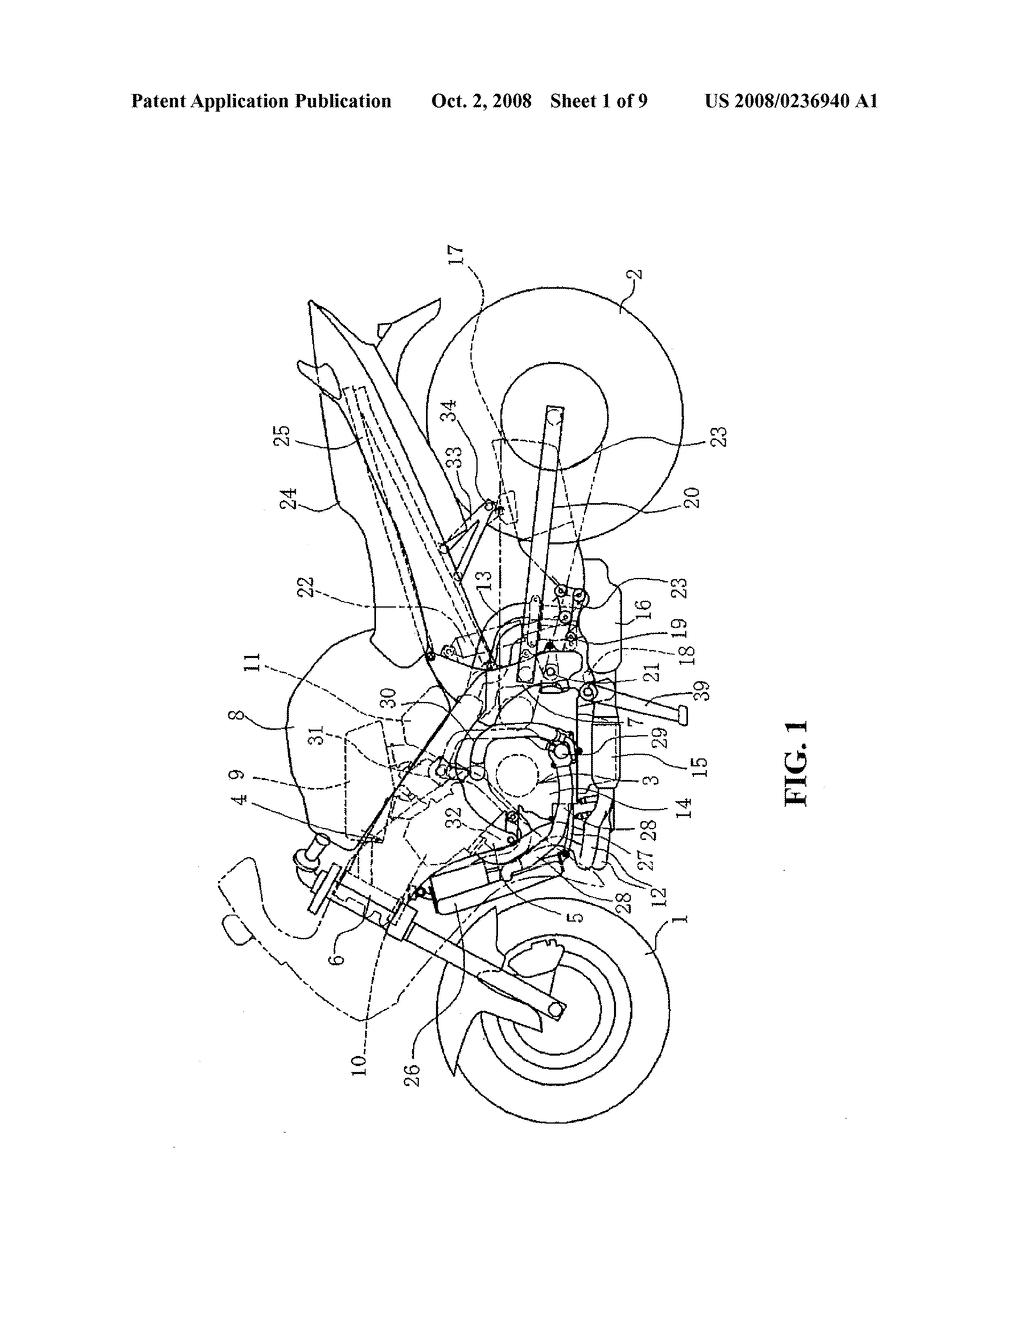 arctic cat 650 v twin wiring diagram 96 dodge caravan ignition coil kawasaki atv for pinterest